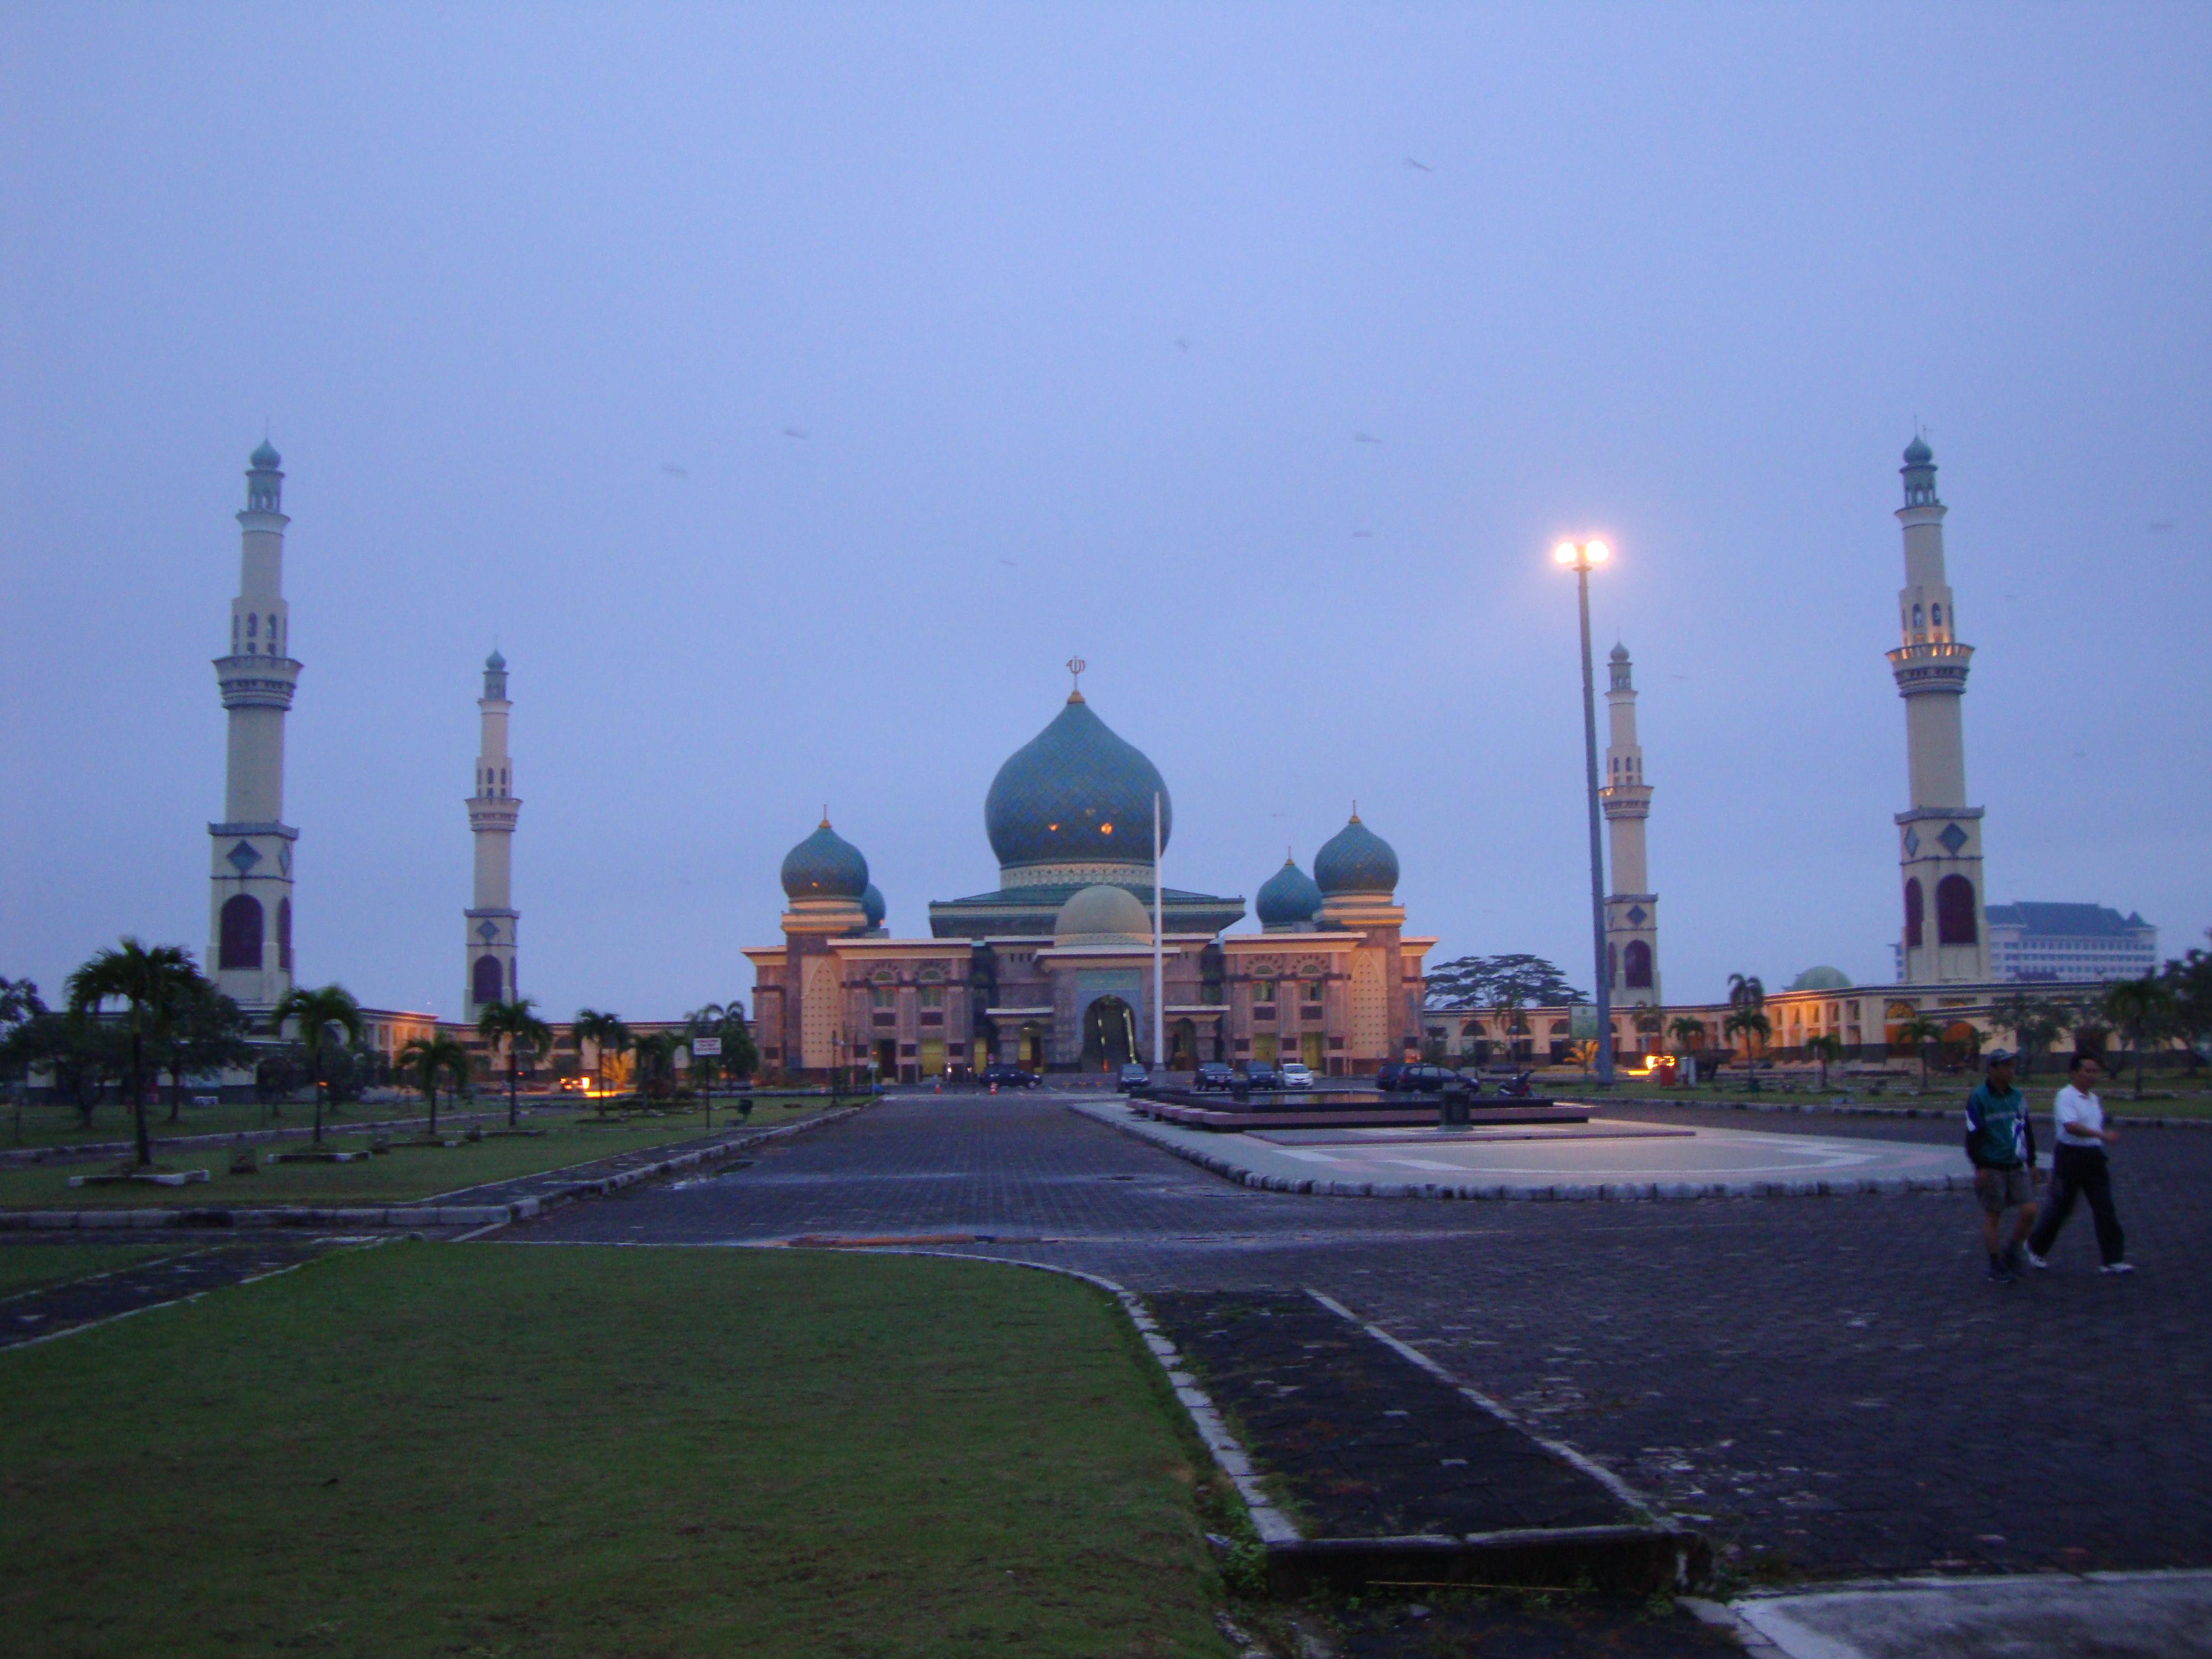 File Masjid Agung Pekanbaru Jpg Wikimedia Commons Raya Kota